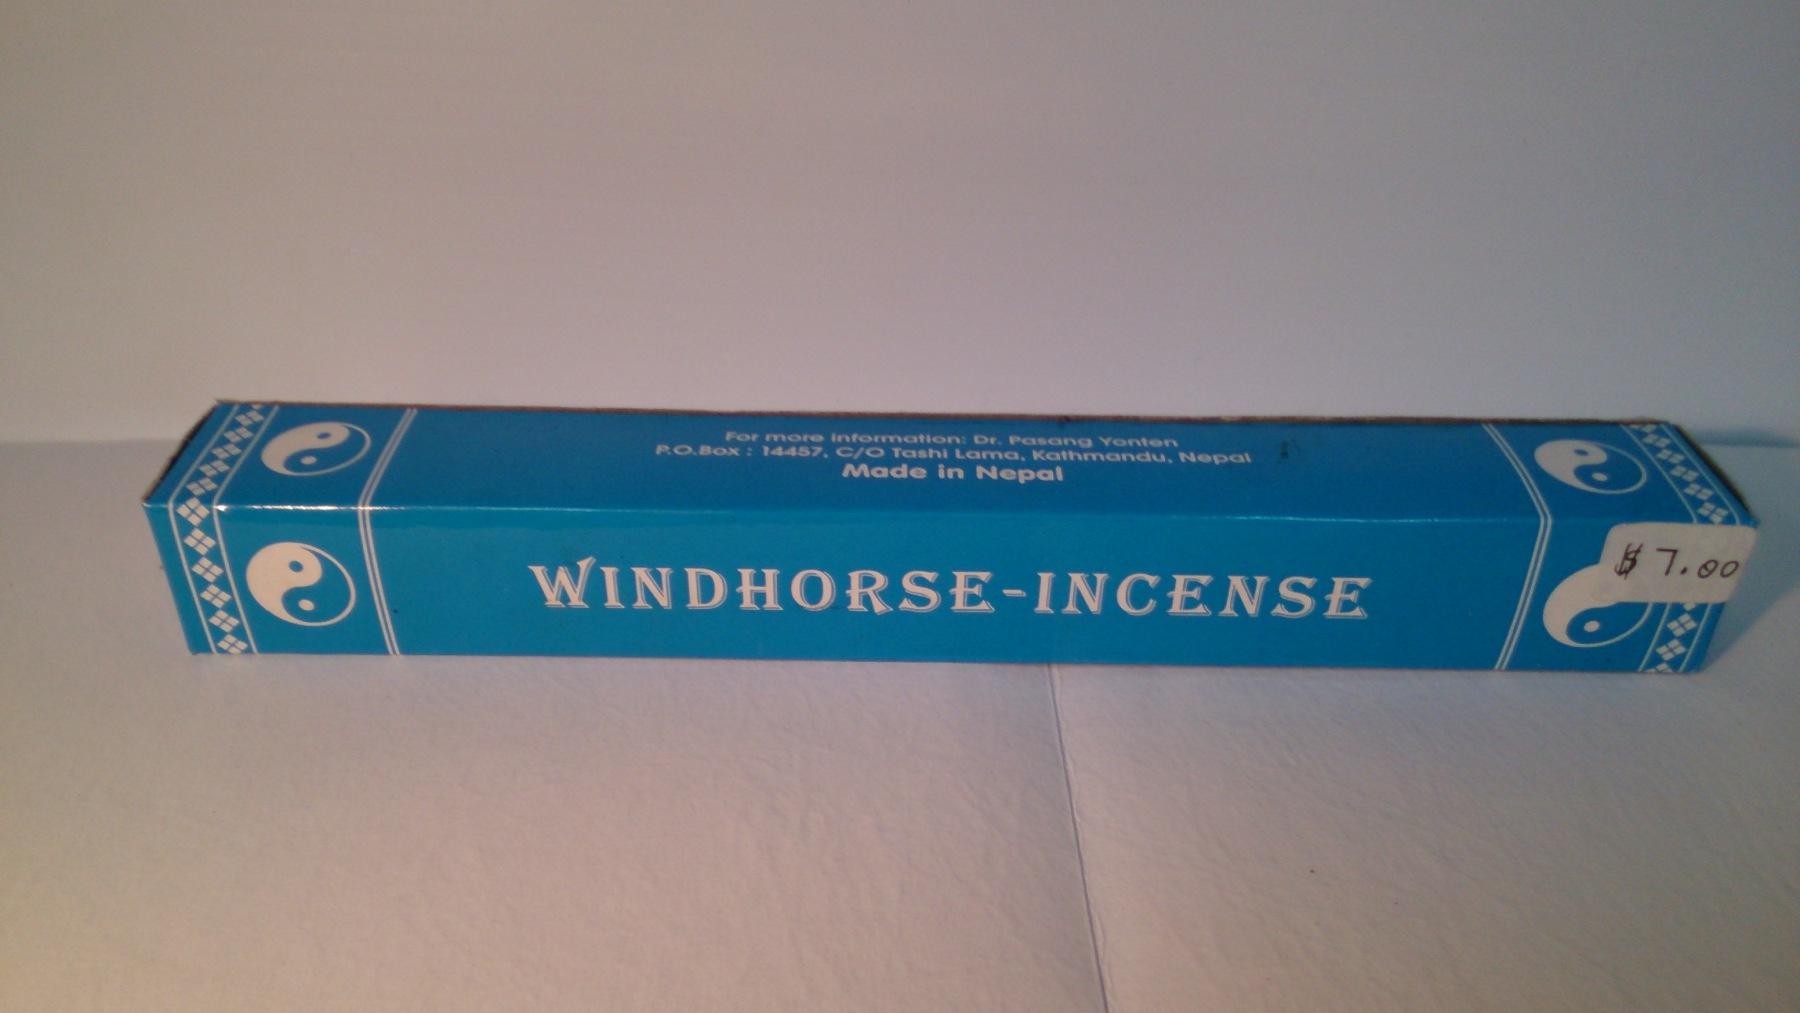 Windhorse incense